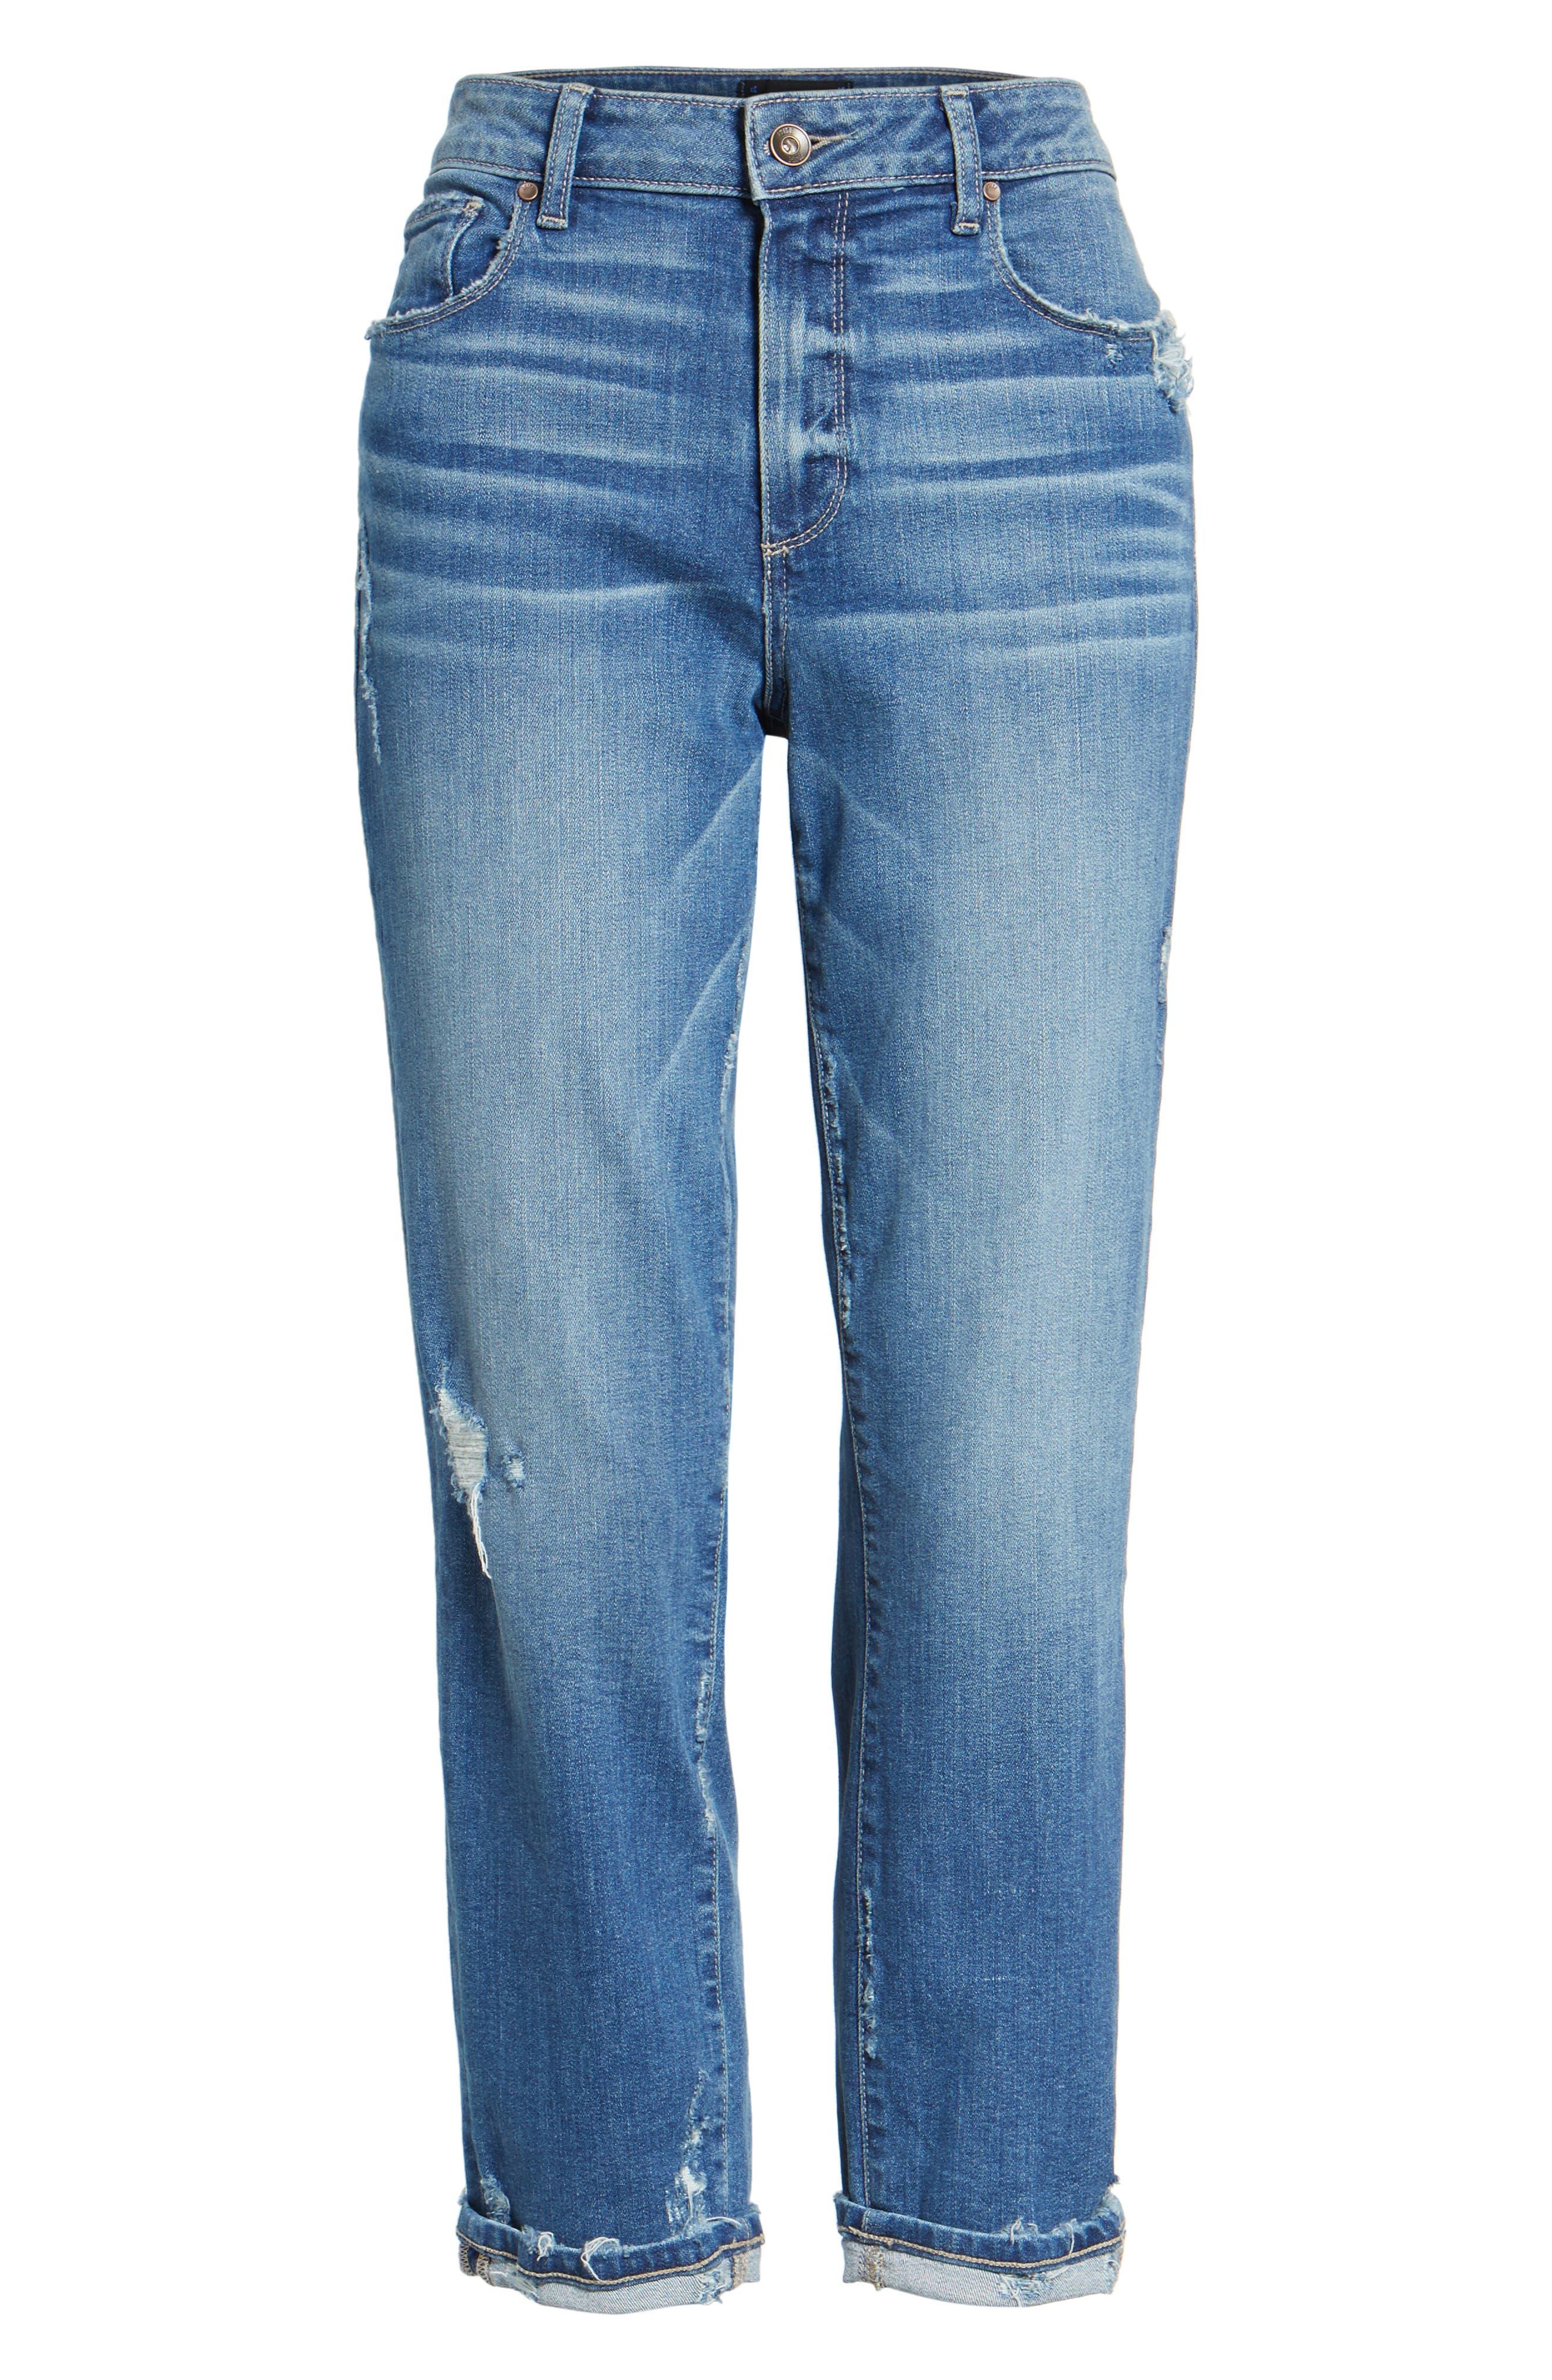 Jimmy Jimmy High Waist Crop Boyfriend Jeans,                             Alternate thumbnail 7, color,                             Ludlow Destructed